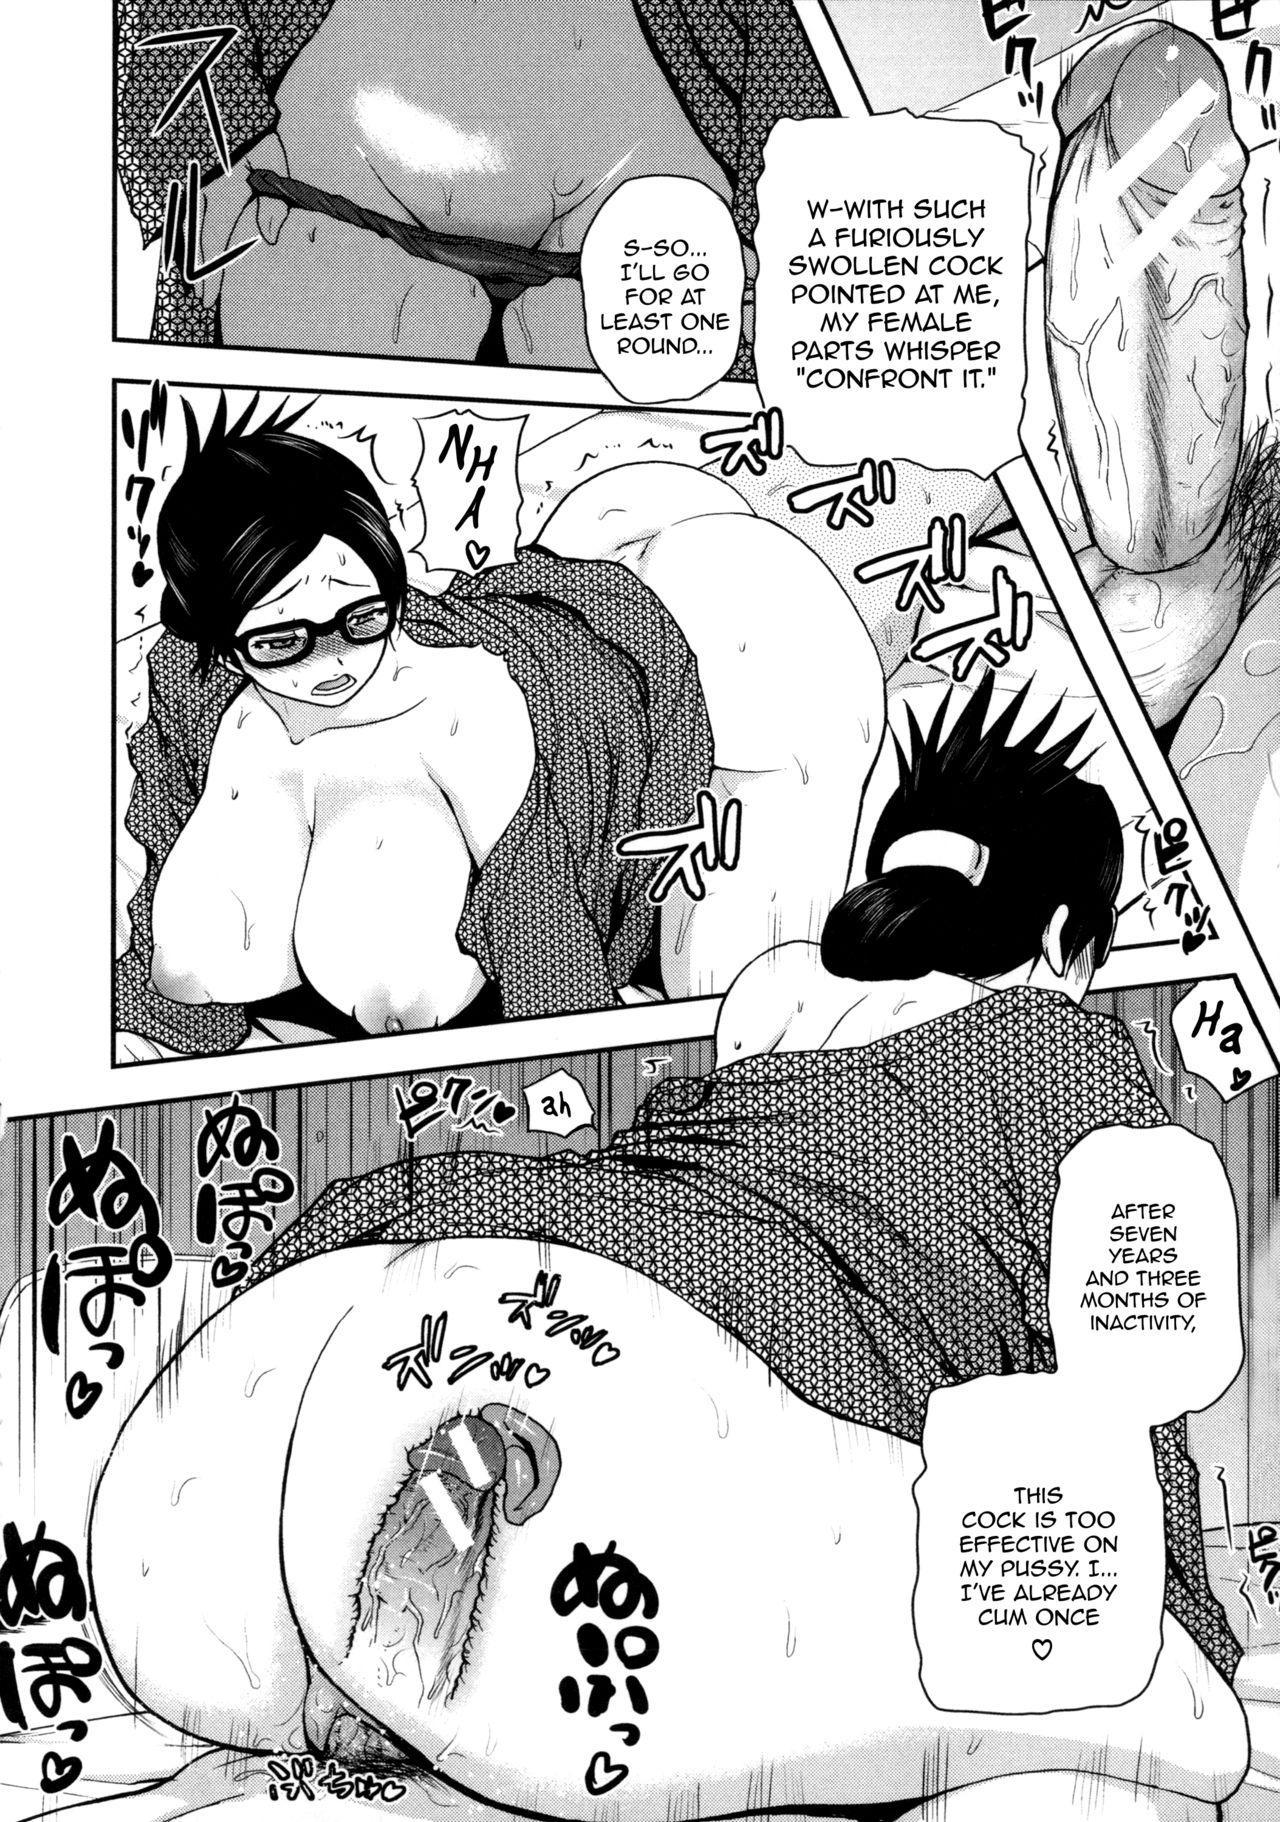 [Yoshimura Tatsumaki] Monzetsu Taigatame ~Count 3 de Ikasete Ageru~ | Faint in Agony Bodylock ~I'll make you cum on the count of 3~ [English] [Brolen] 225